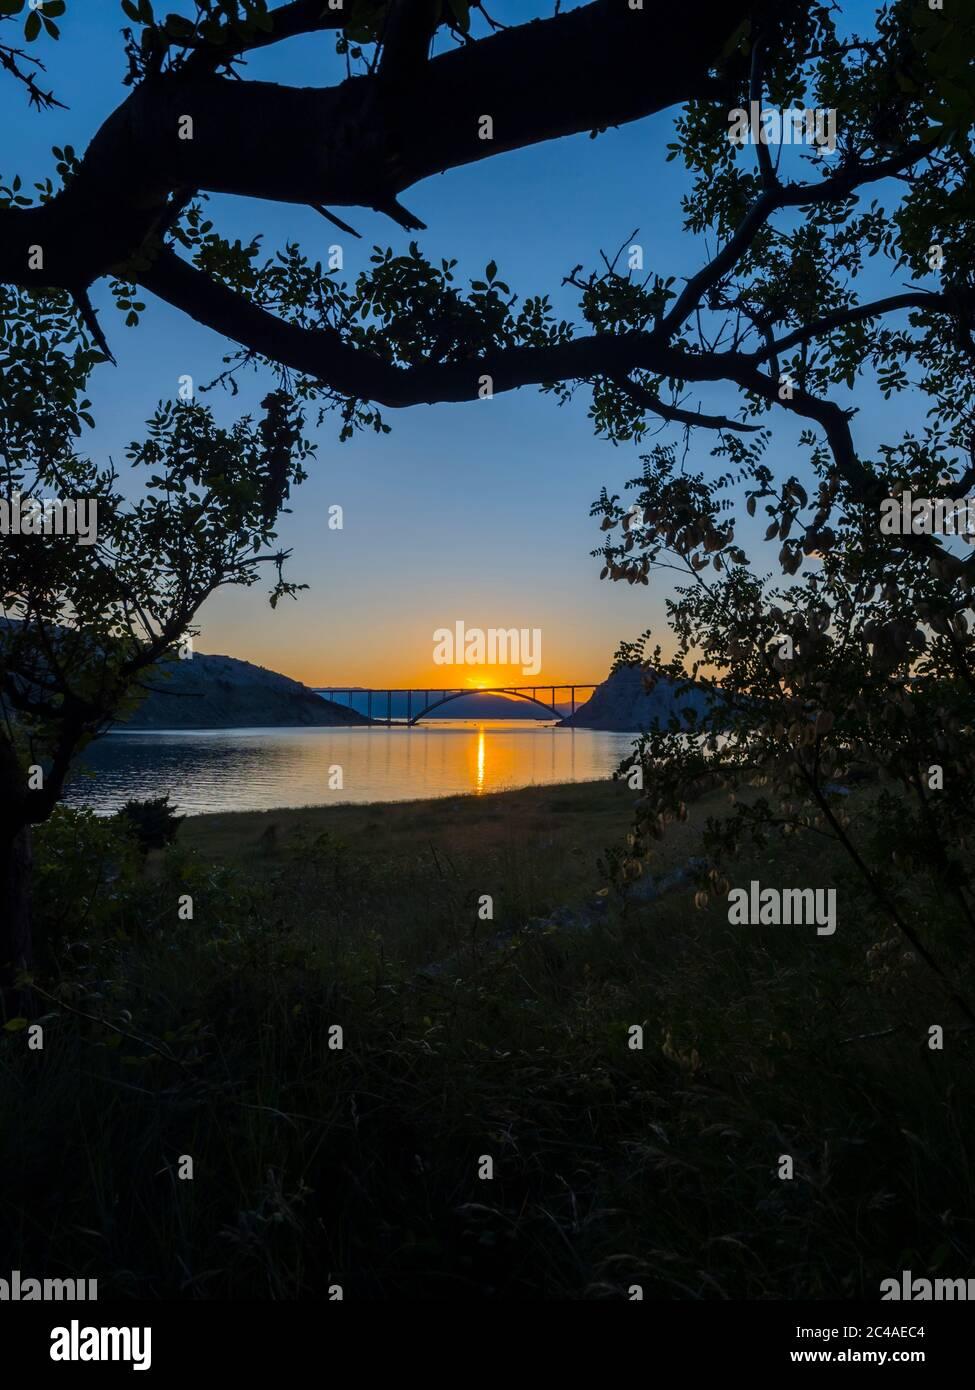 Sunset landscape silhouette silhouetting trees bridge mainland to island Krk Croatia quiet calm calmness Stock Photo